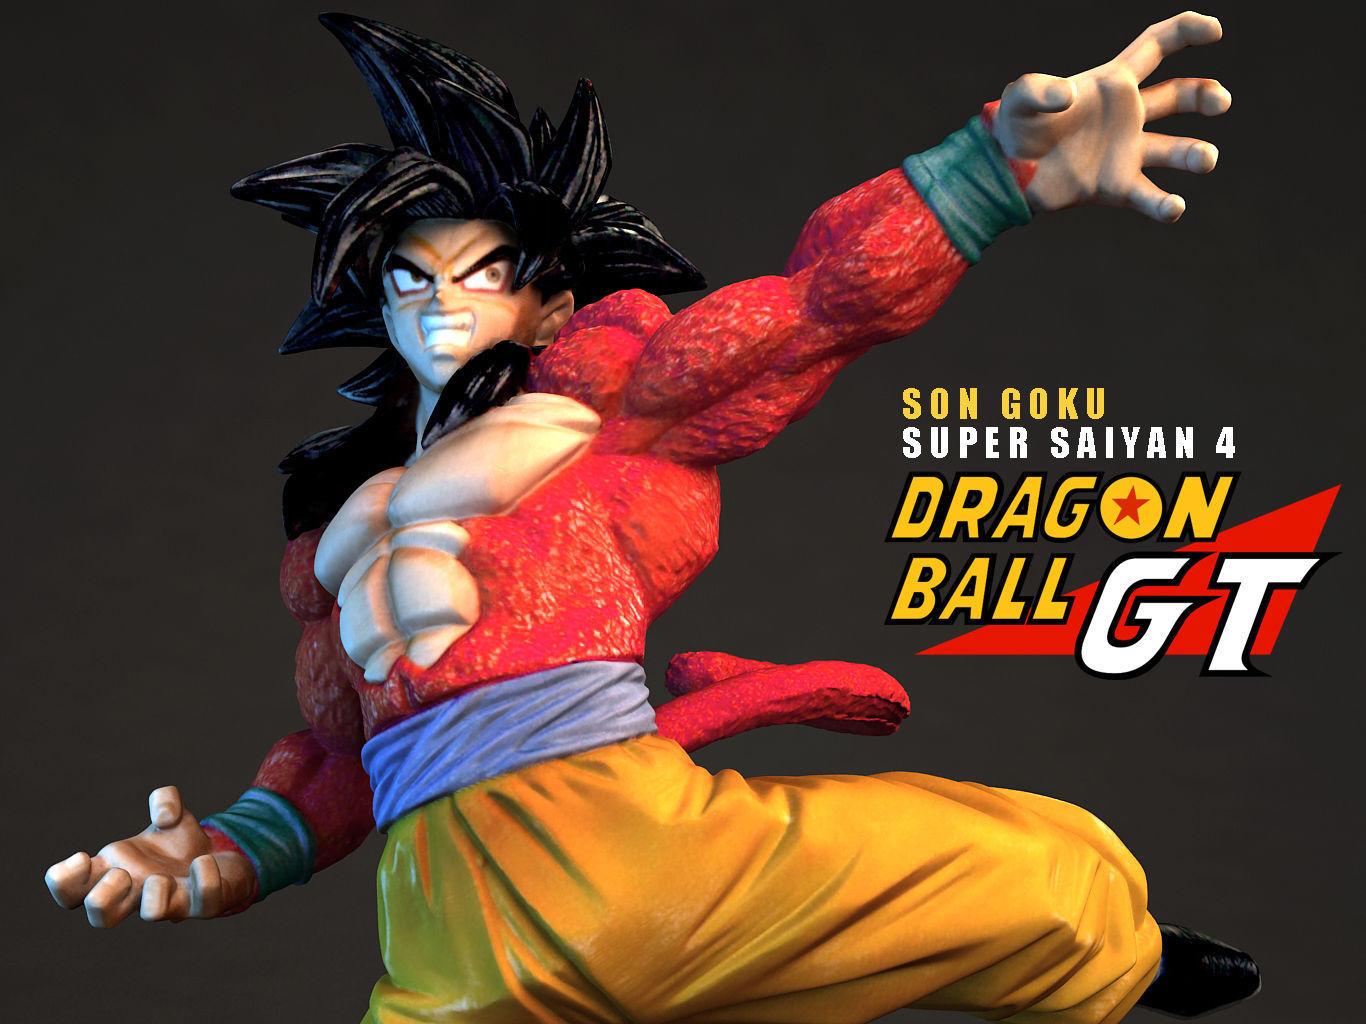 Super Saiyan 4 Goku 3d Model Obj Fbx Mtl 2